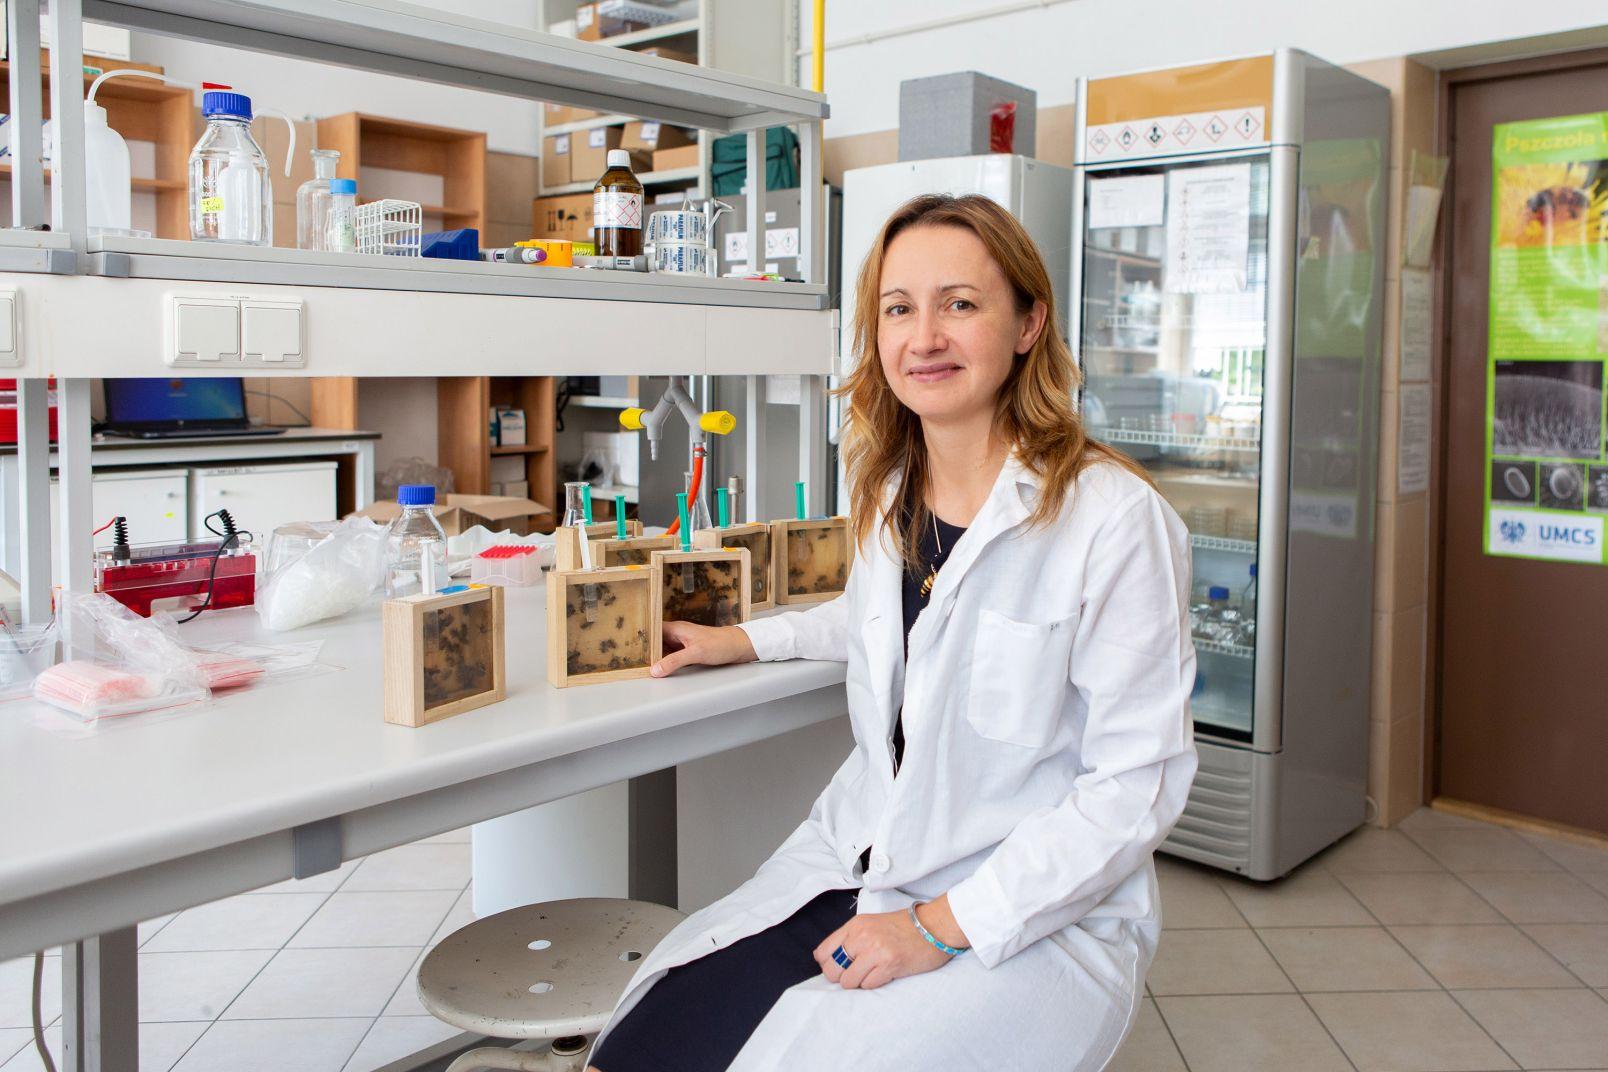 dr hab. Aneta Ptaszyńska, prof. UMCS